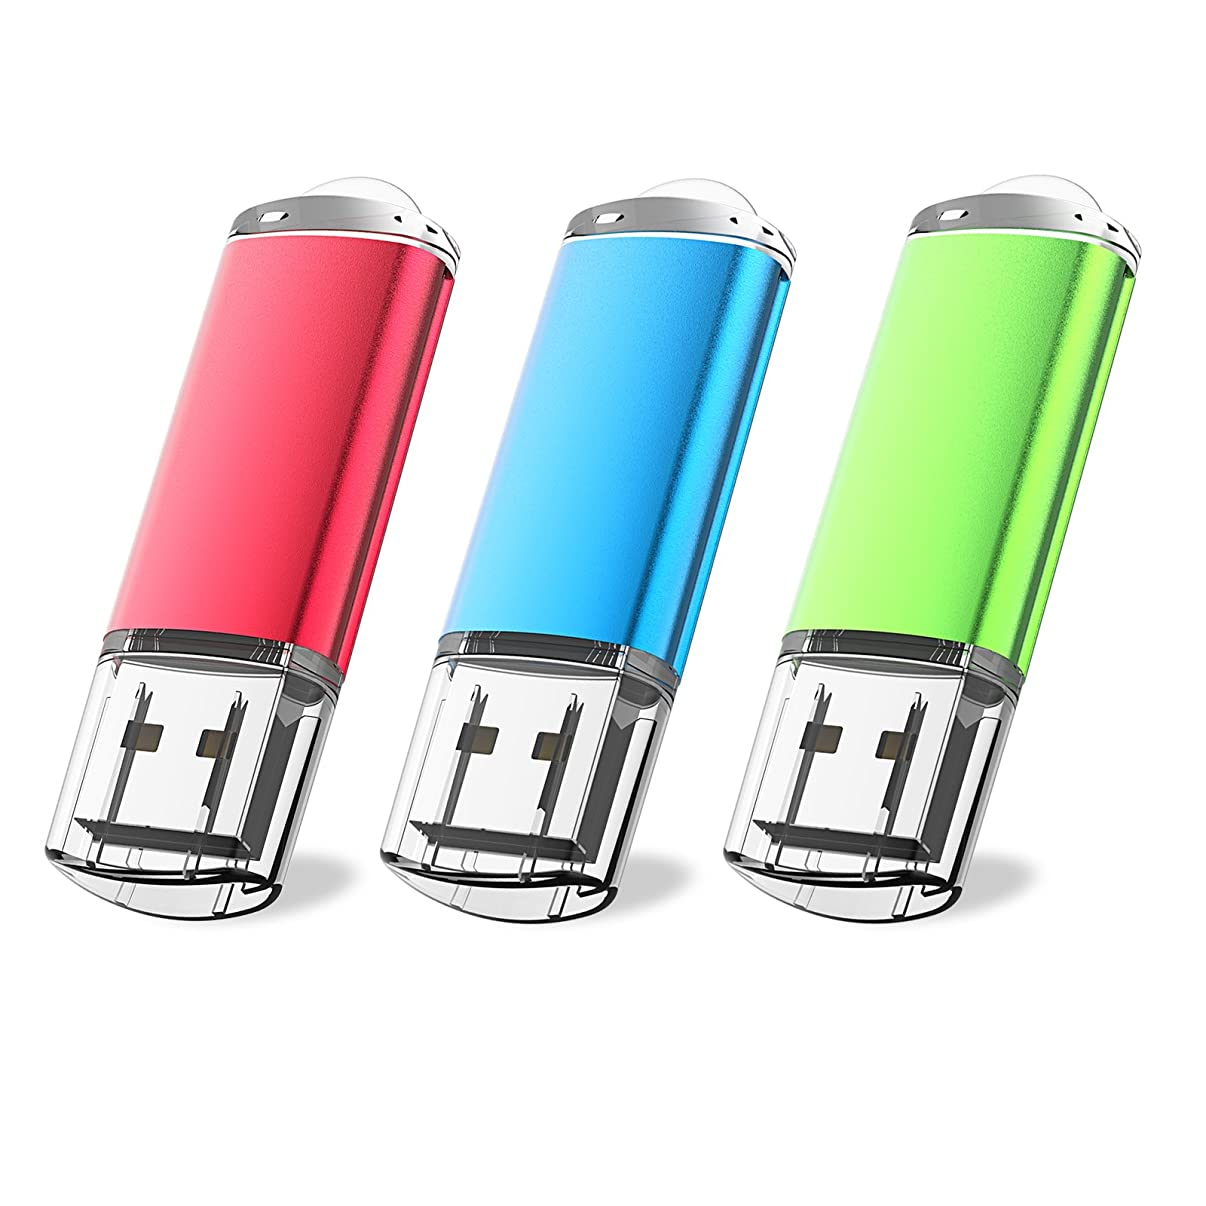 JUANWE 3 Pack 16GB USB Flash Drive USB 2.0 Thumb Drives Fold Storage Memory Stick Pen - Red/Blue/Green(16GB,3 Mixed Color)